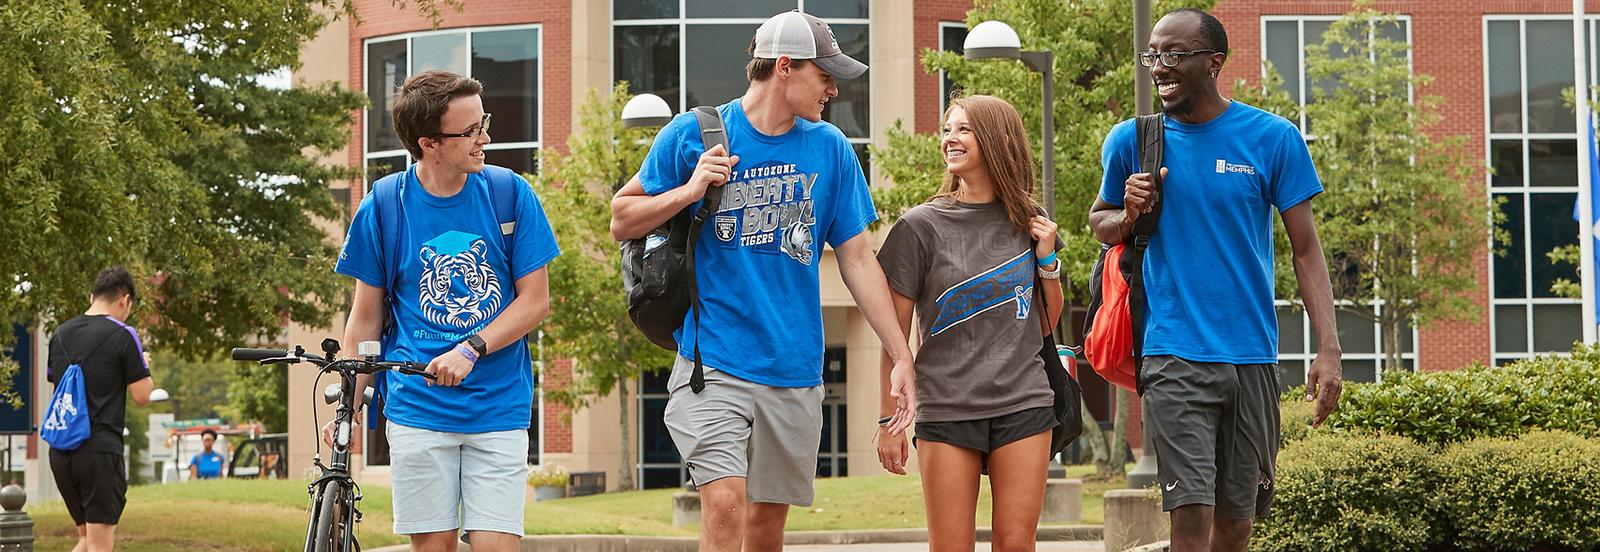 happy students walking